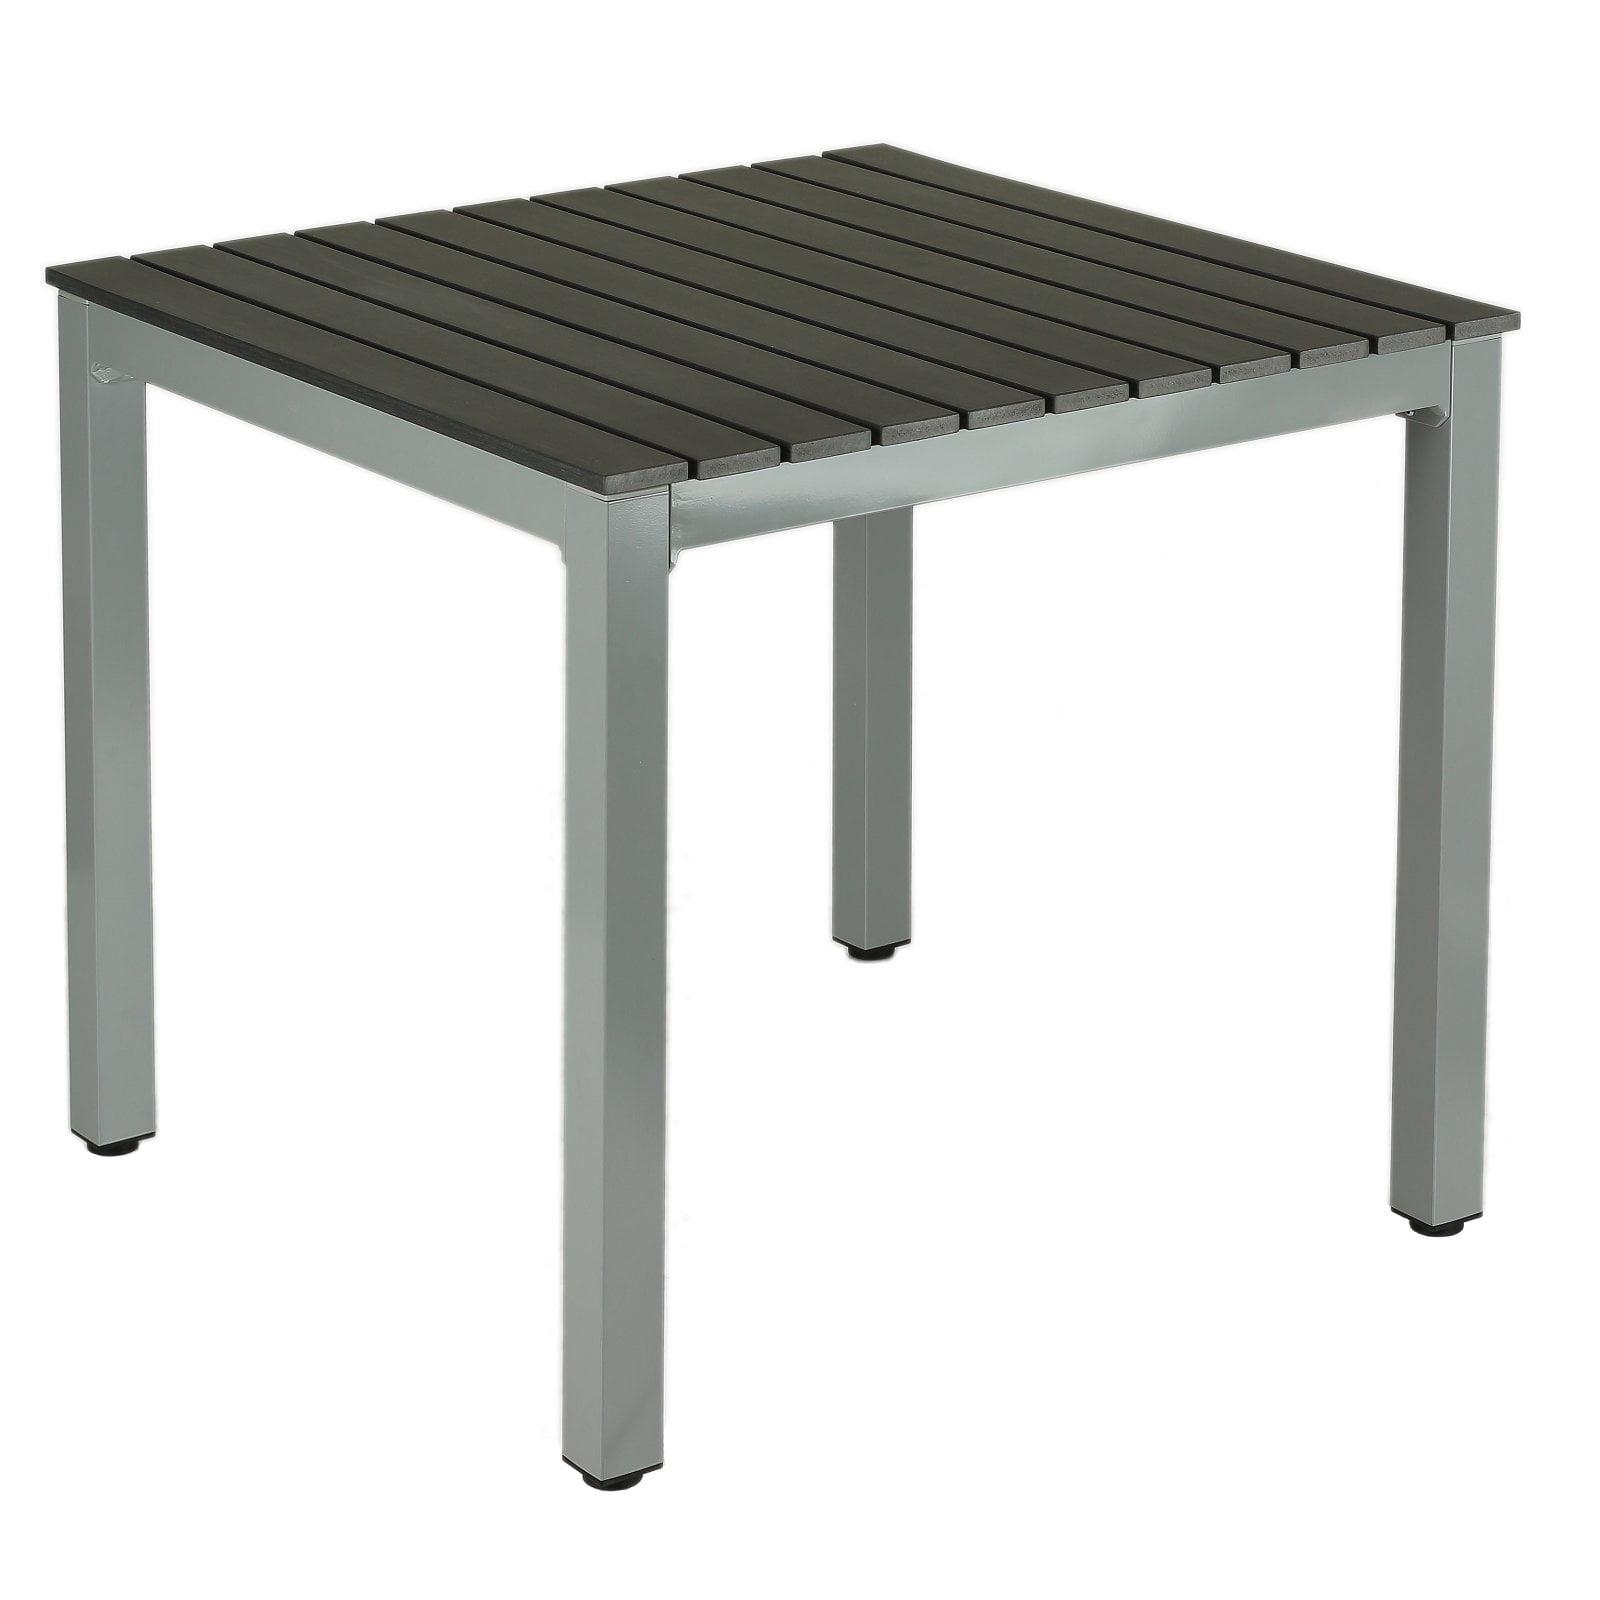 Cortesi Home Jaxon Aluminum Patio Dining Table